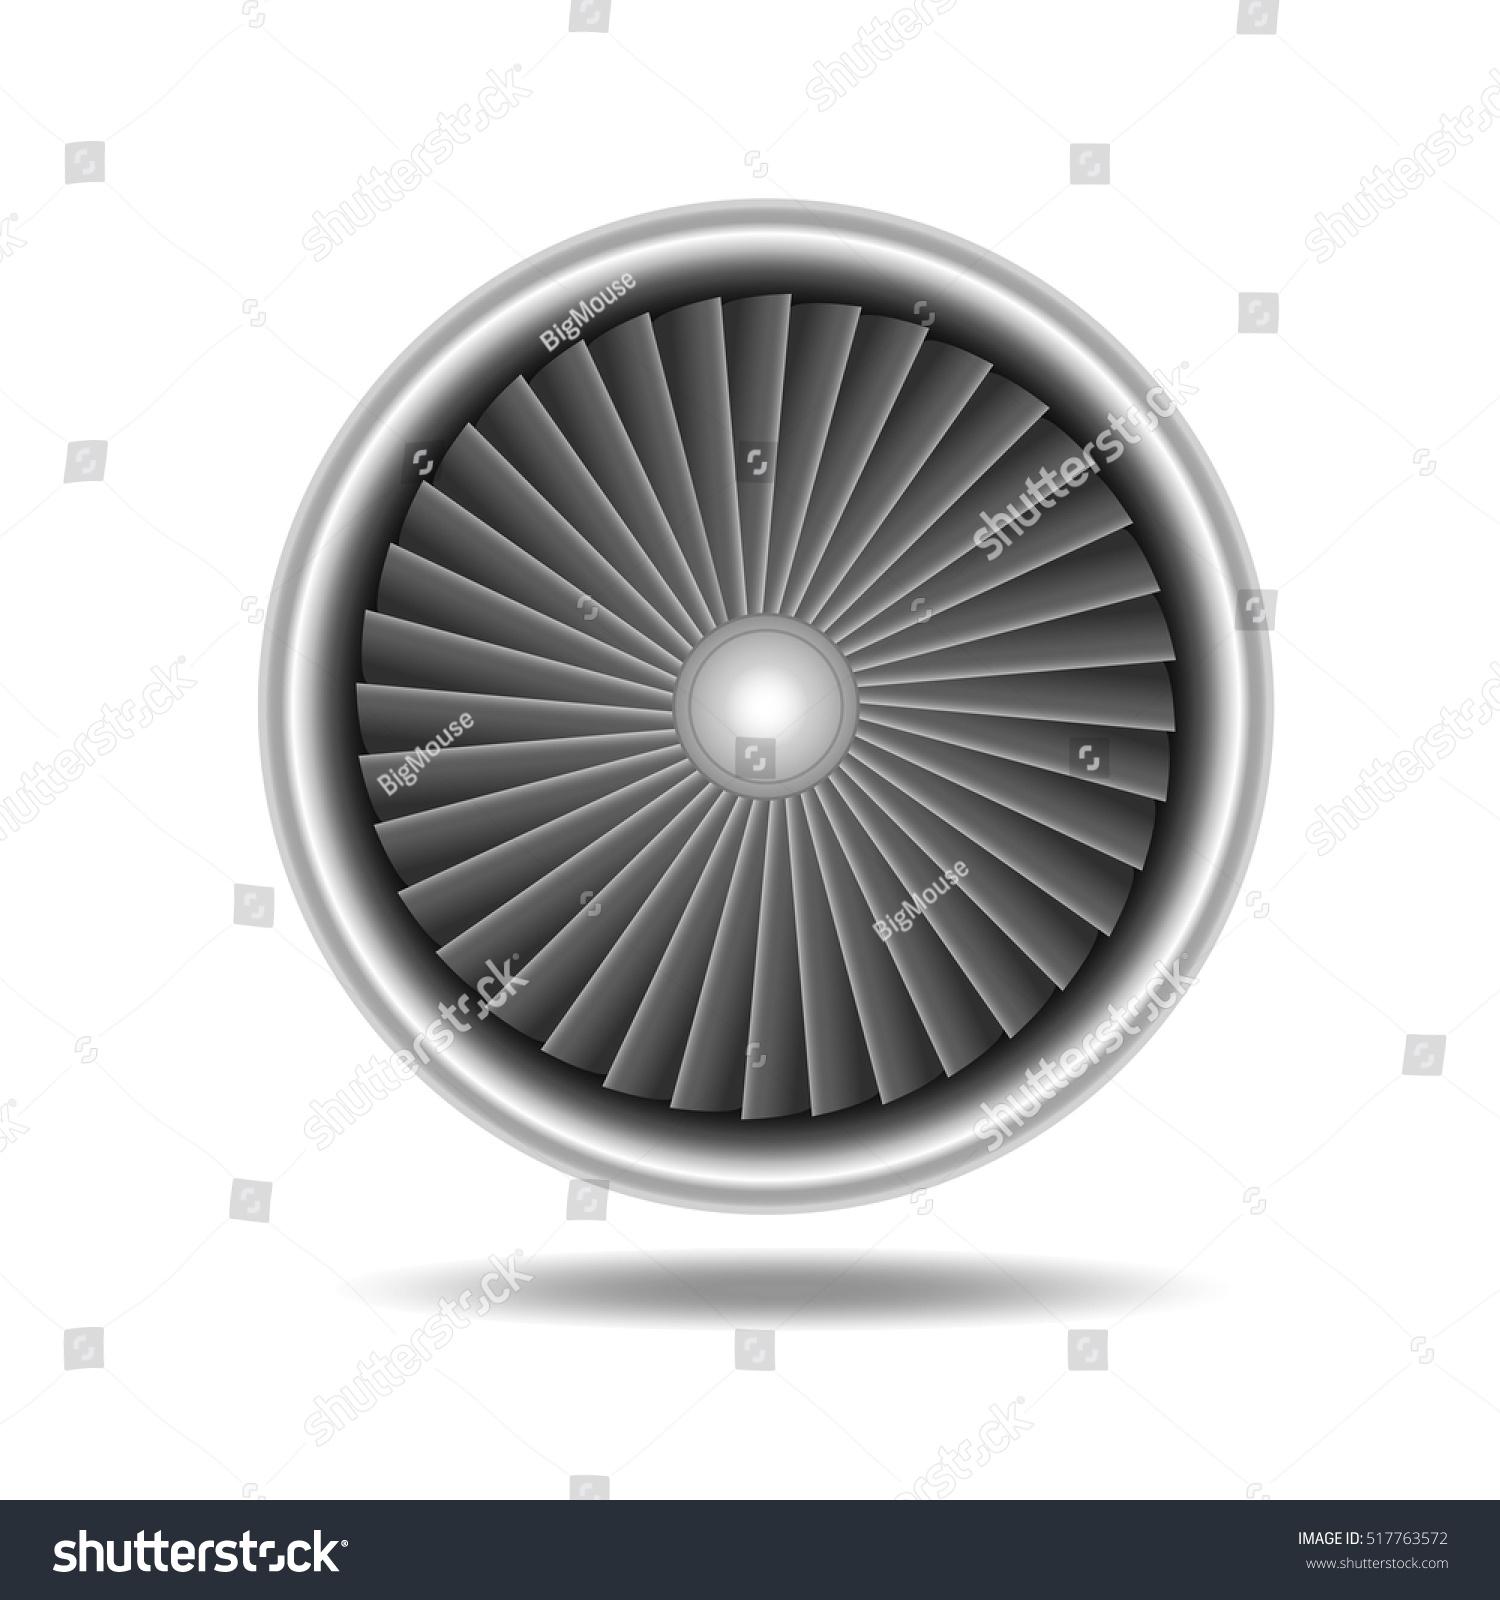 Jet Engine Turbine Detailed Airplane Stock Vector